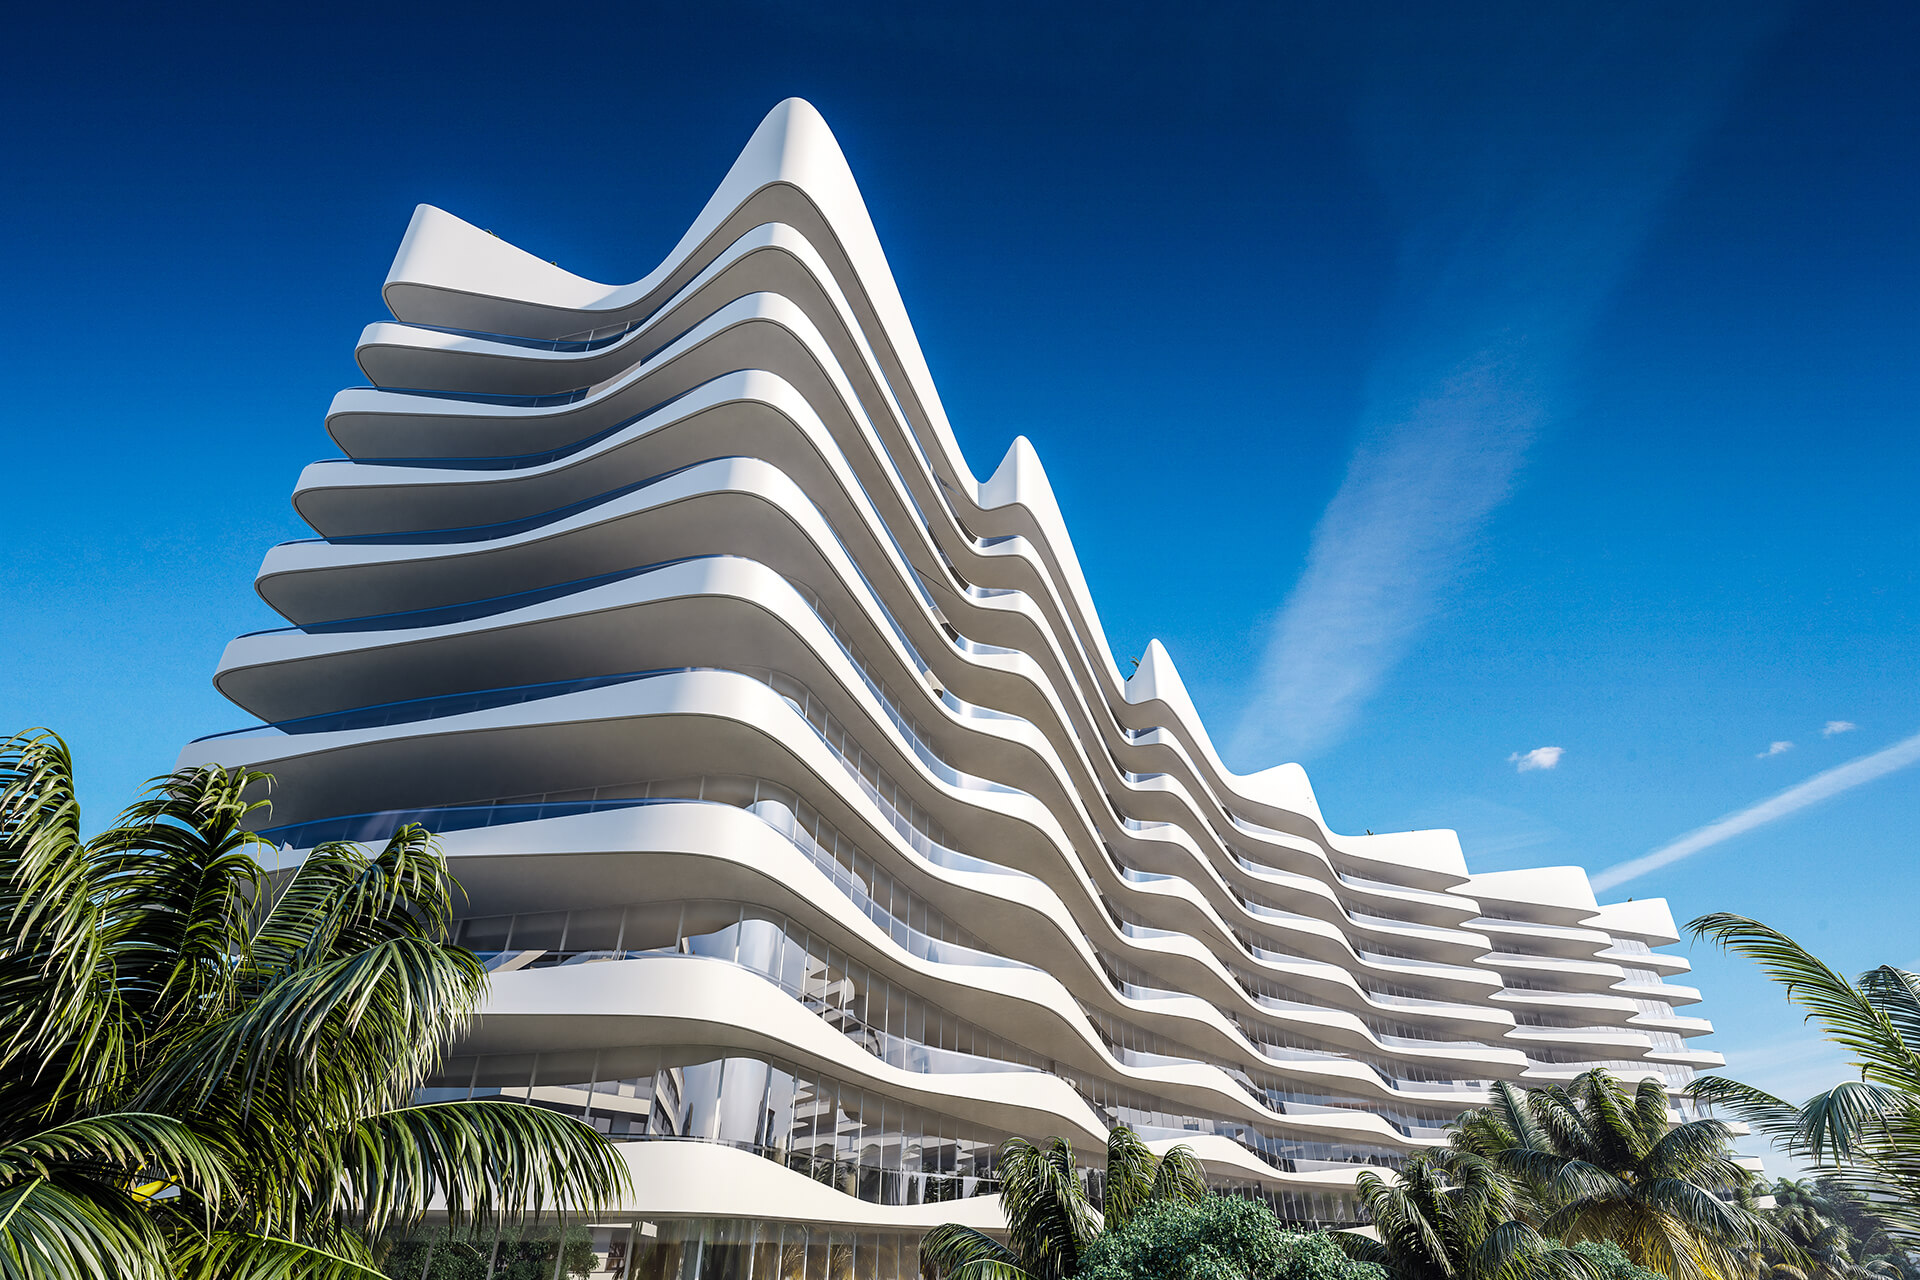 BORA <br/> New Luxury residential development